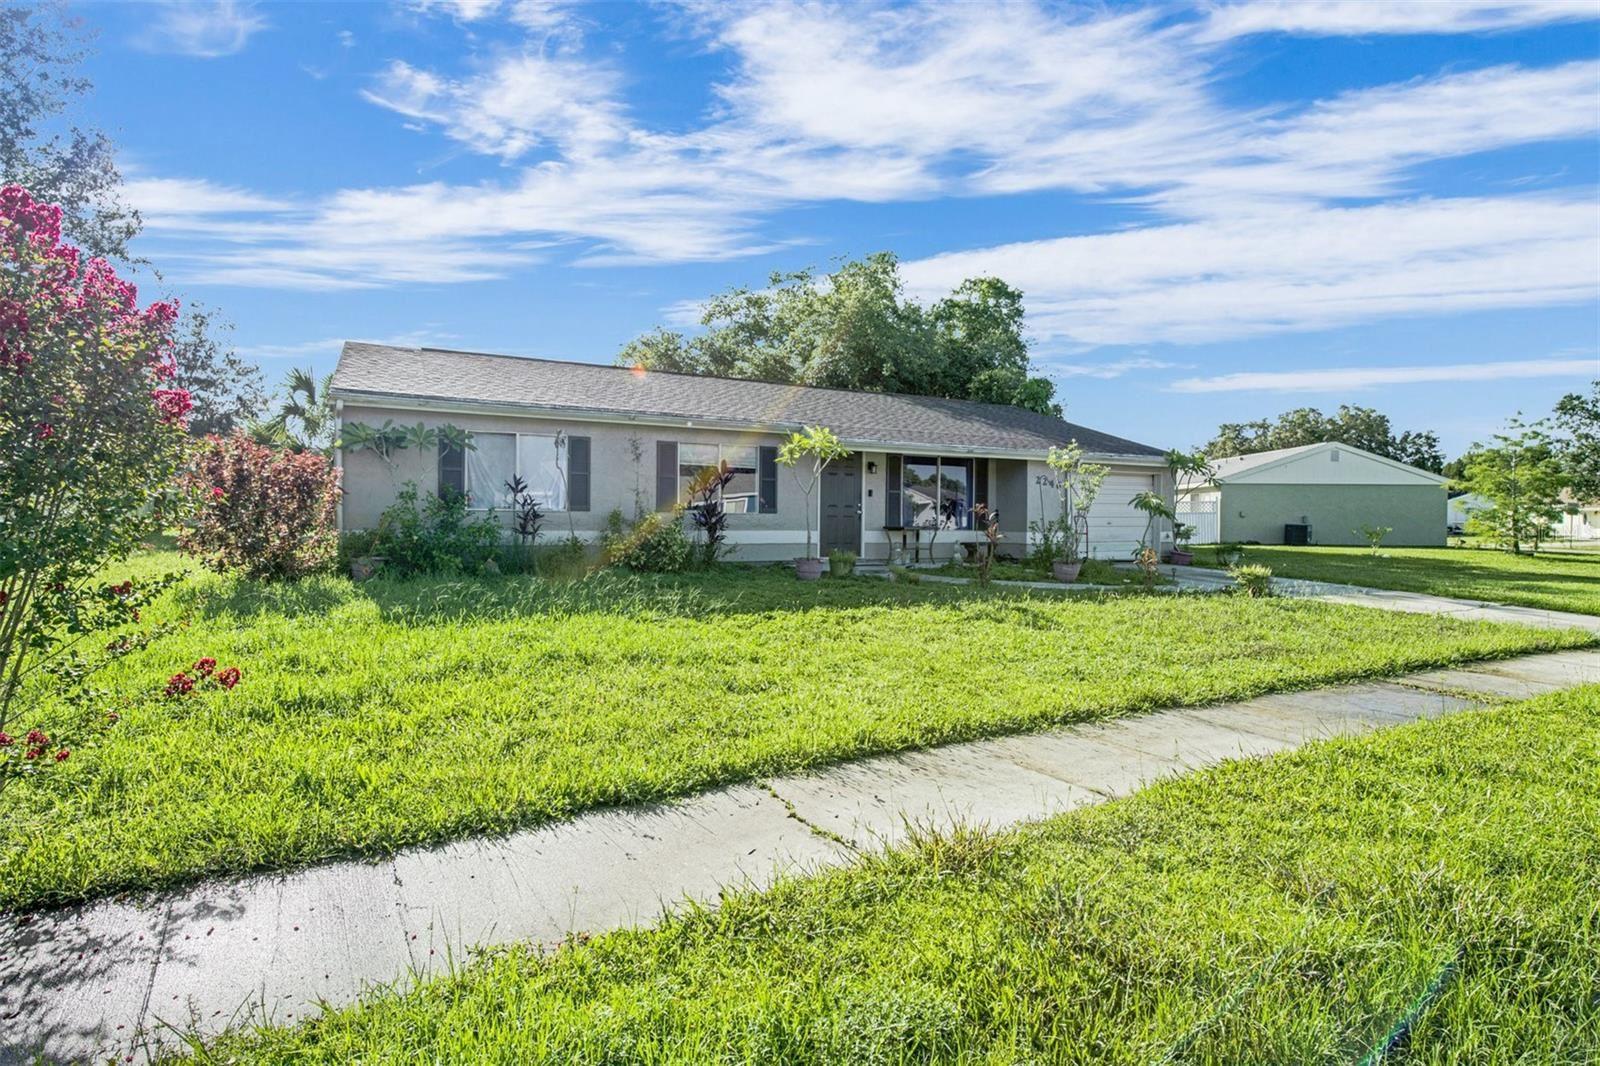 Photo of 2246 SHENANDOAH STREET, NORTH PORT, FL 34287 (MLS # A4506037)